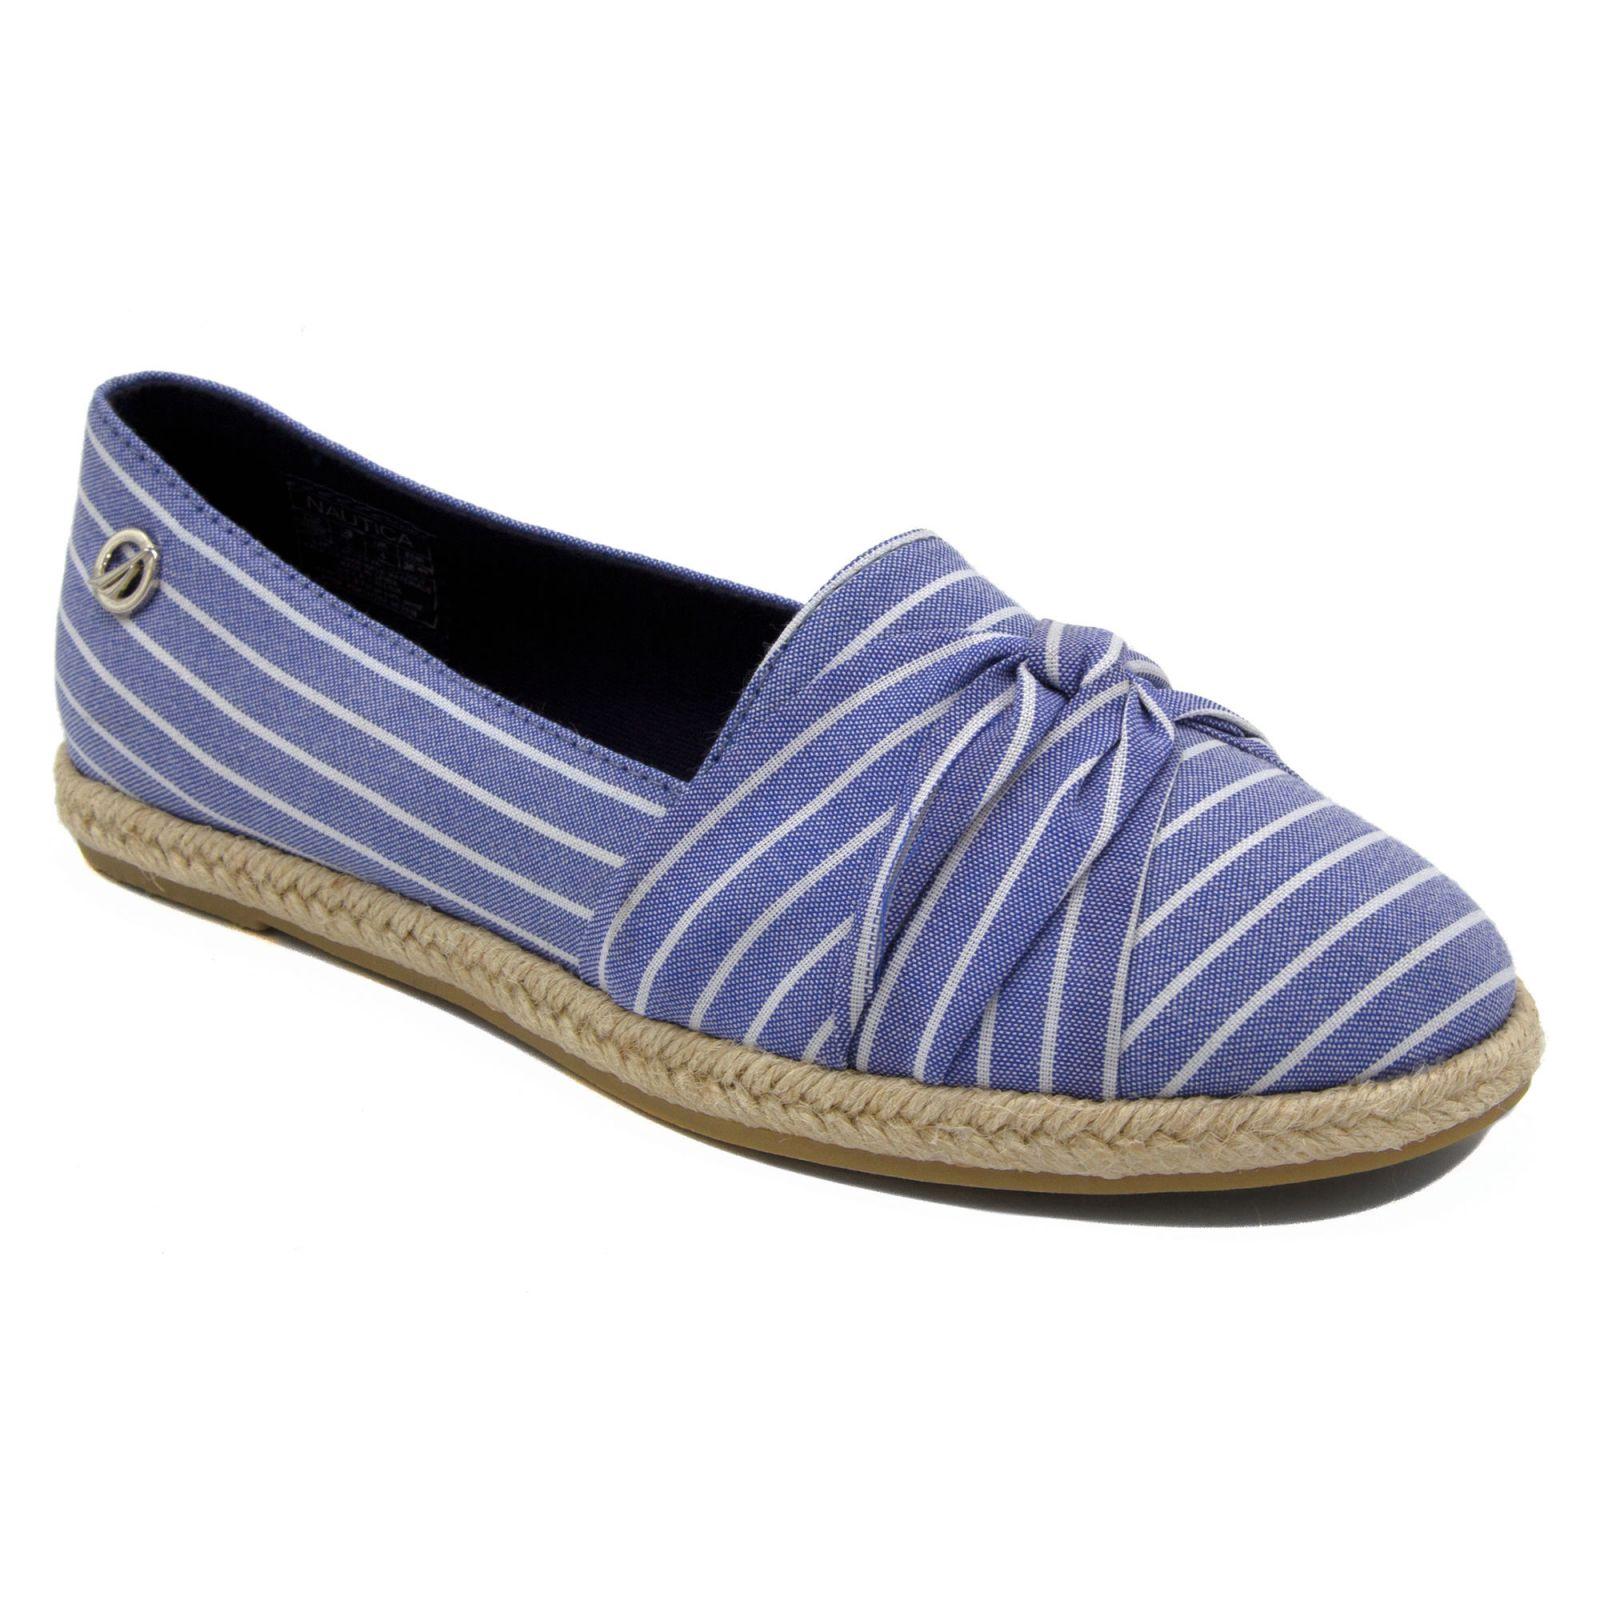 Nautica sandále, žabky Idelle Slip-On Shoes